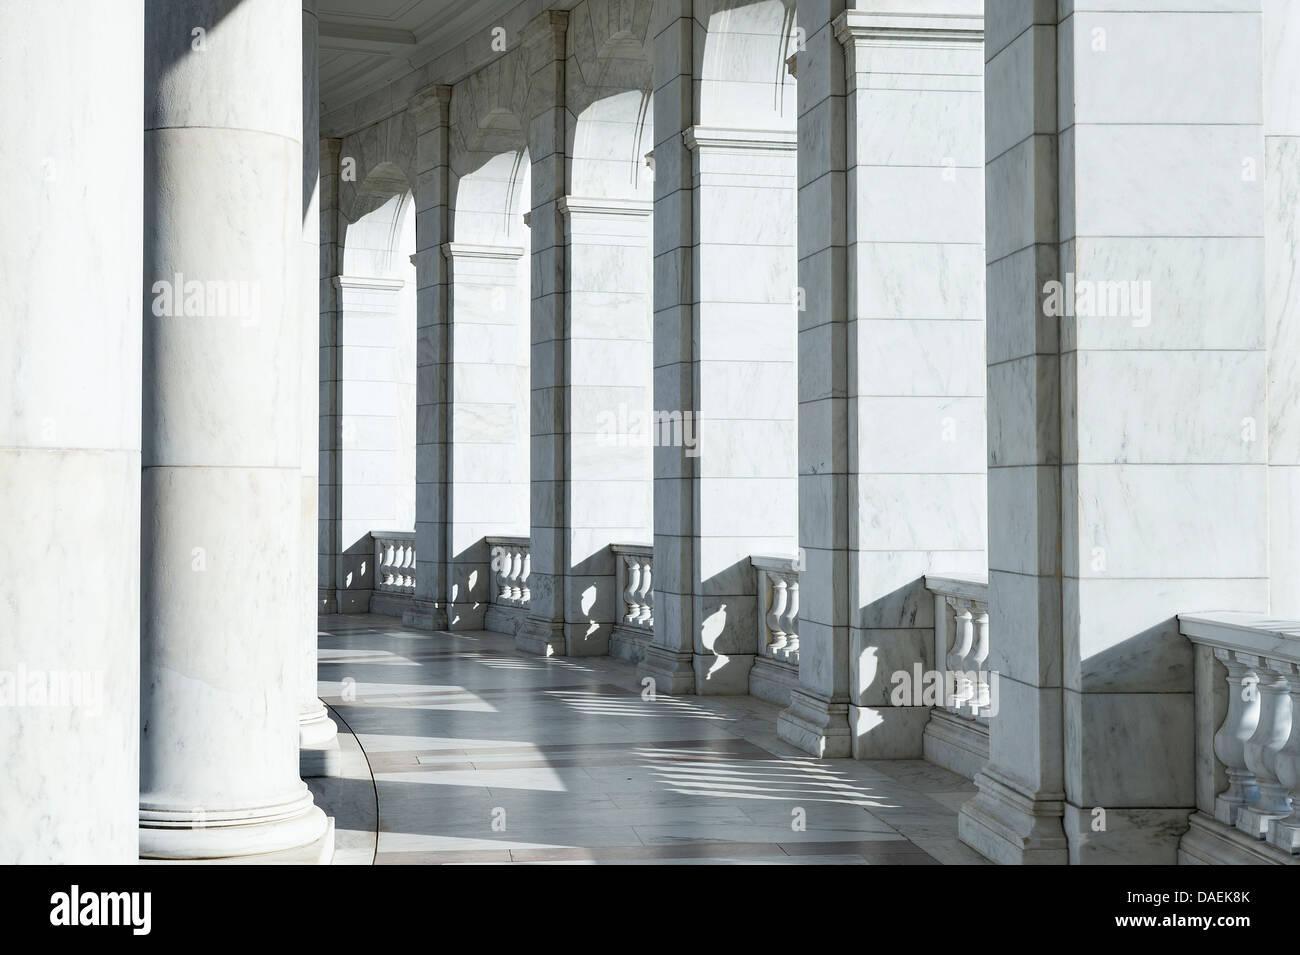 Elegant granite portico. - Stock Image